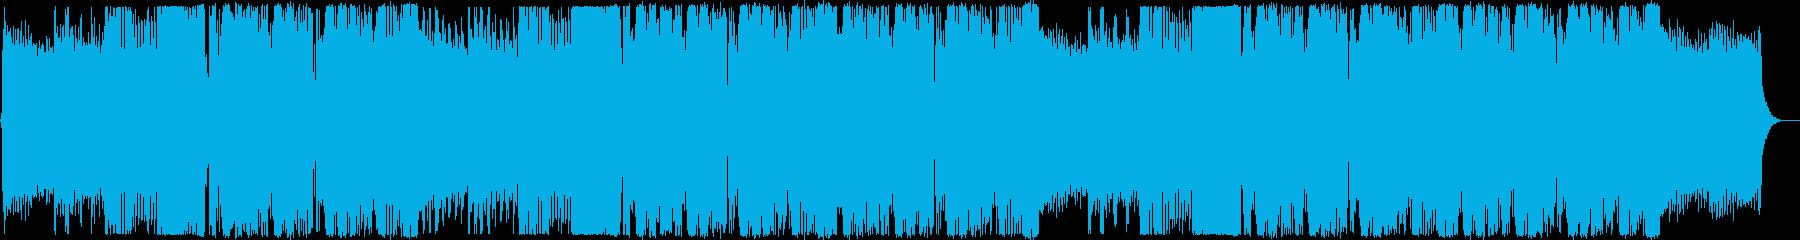 EDM 未来 期待 始まり 躍動感 感動の再生済みの波形